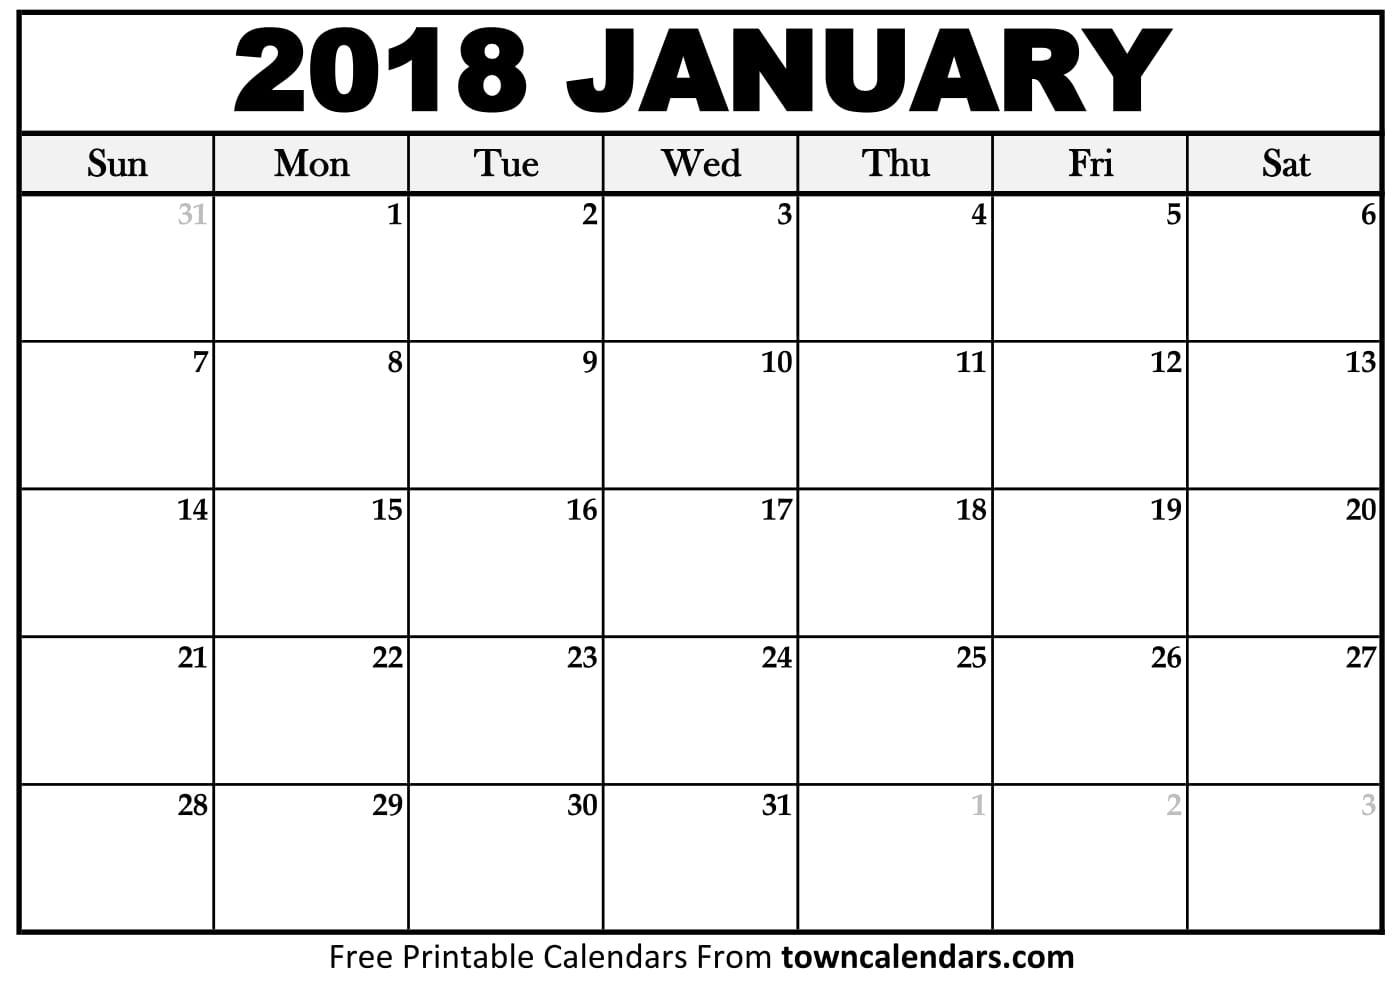 2018 Calendar Printable - towncalendars